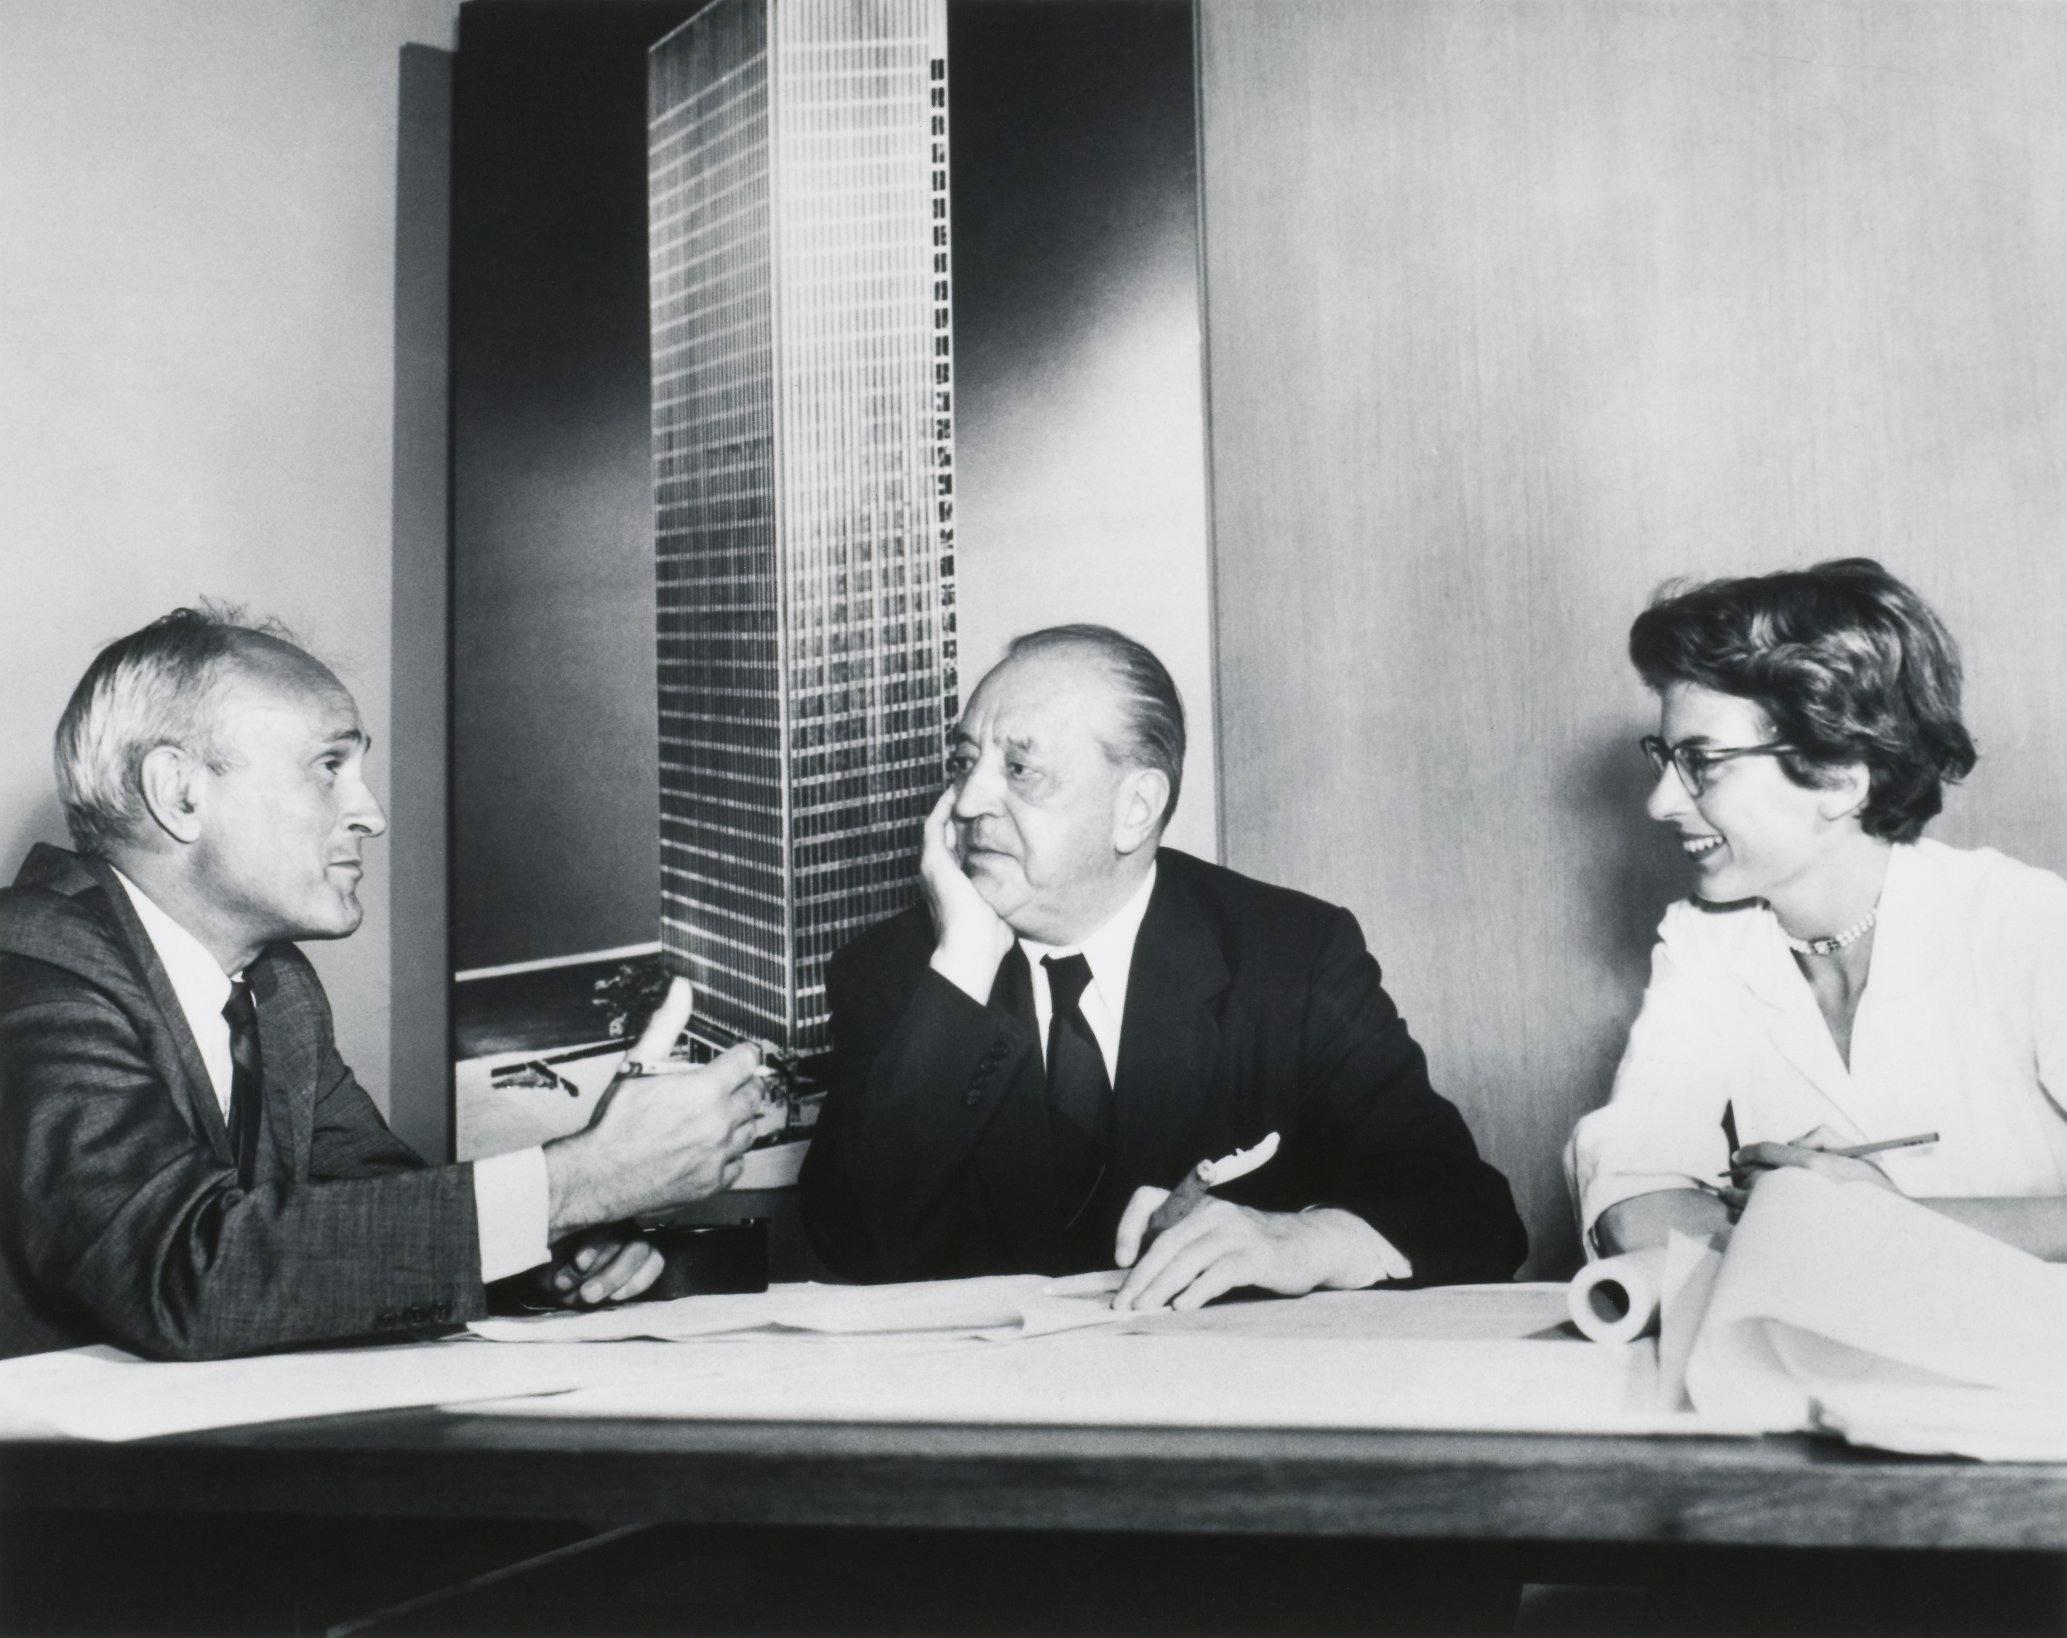 Con Koolhaas il Leone d'oro alla carriera va a Phyllis Lambert